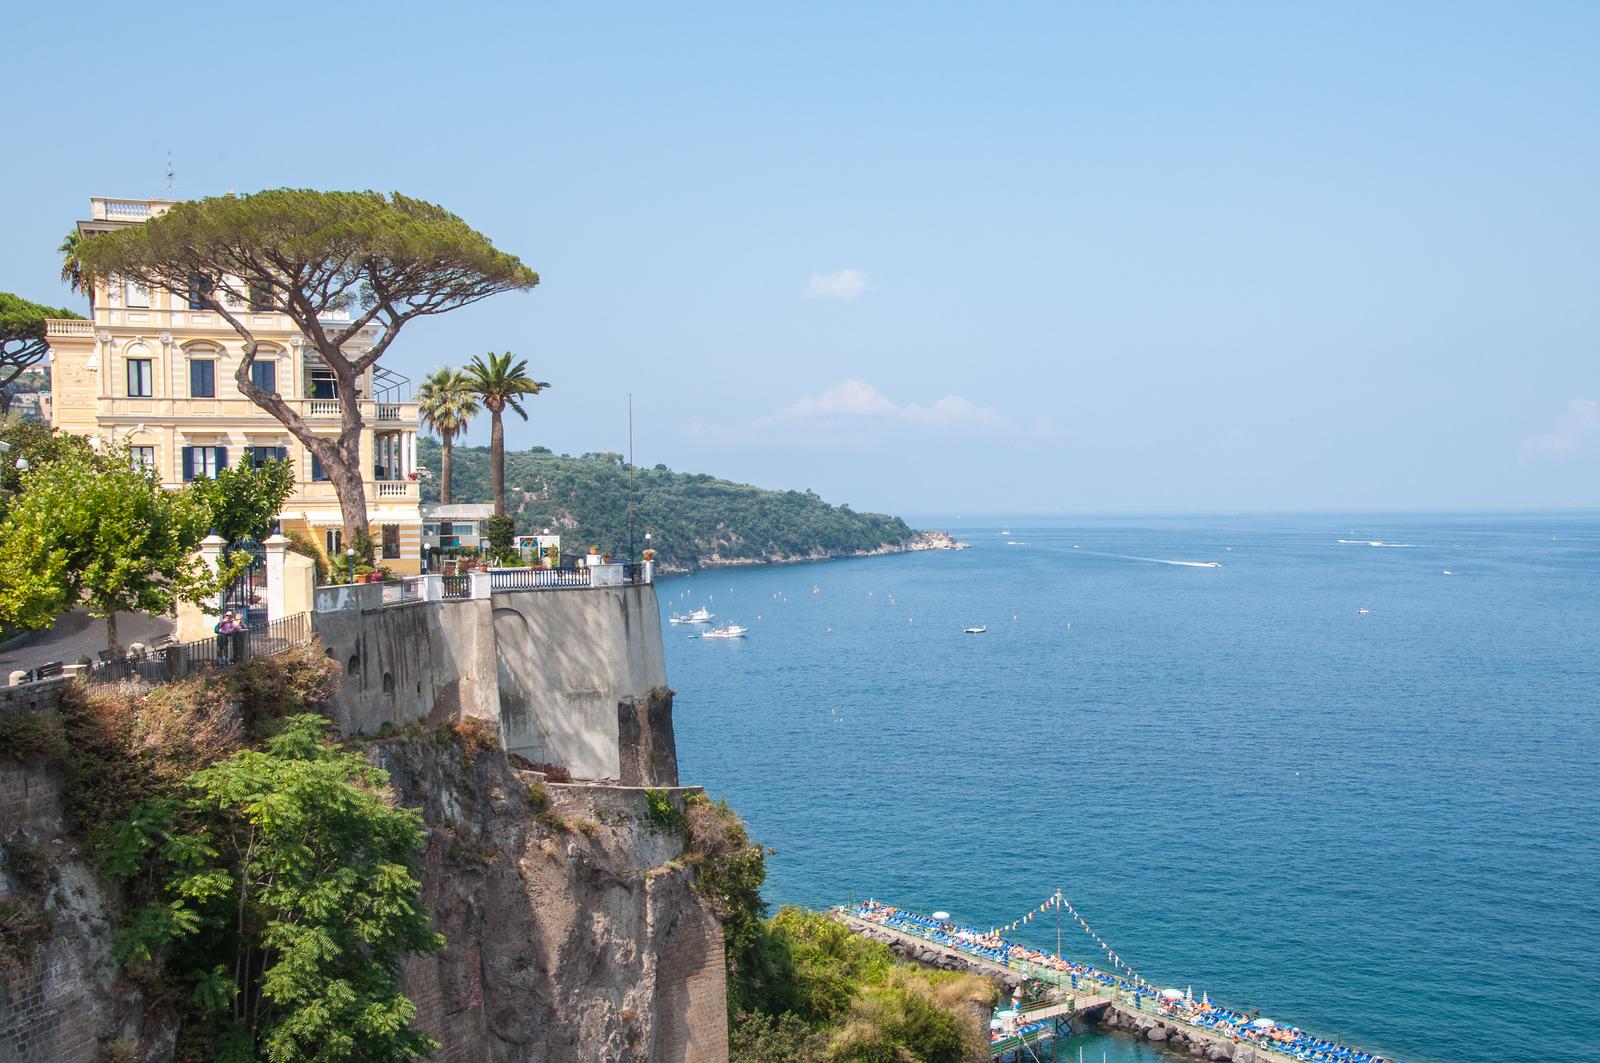 Sorrento Cliffs